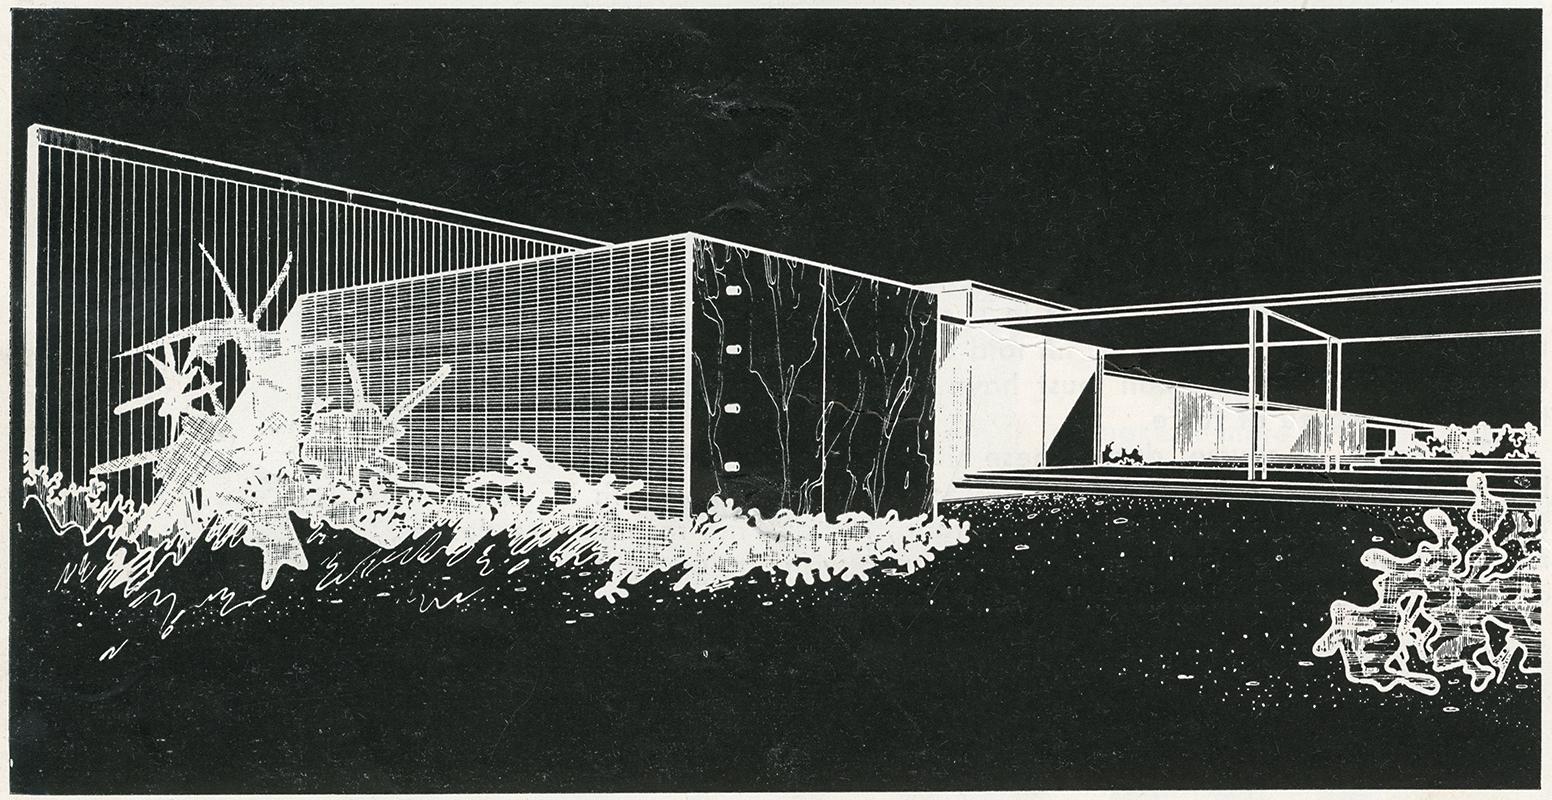 William F. Cody. Arts and Architecture. Sep 1952, 18